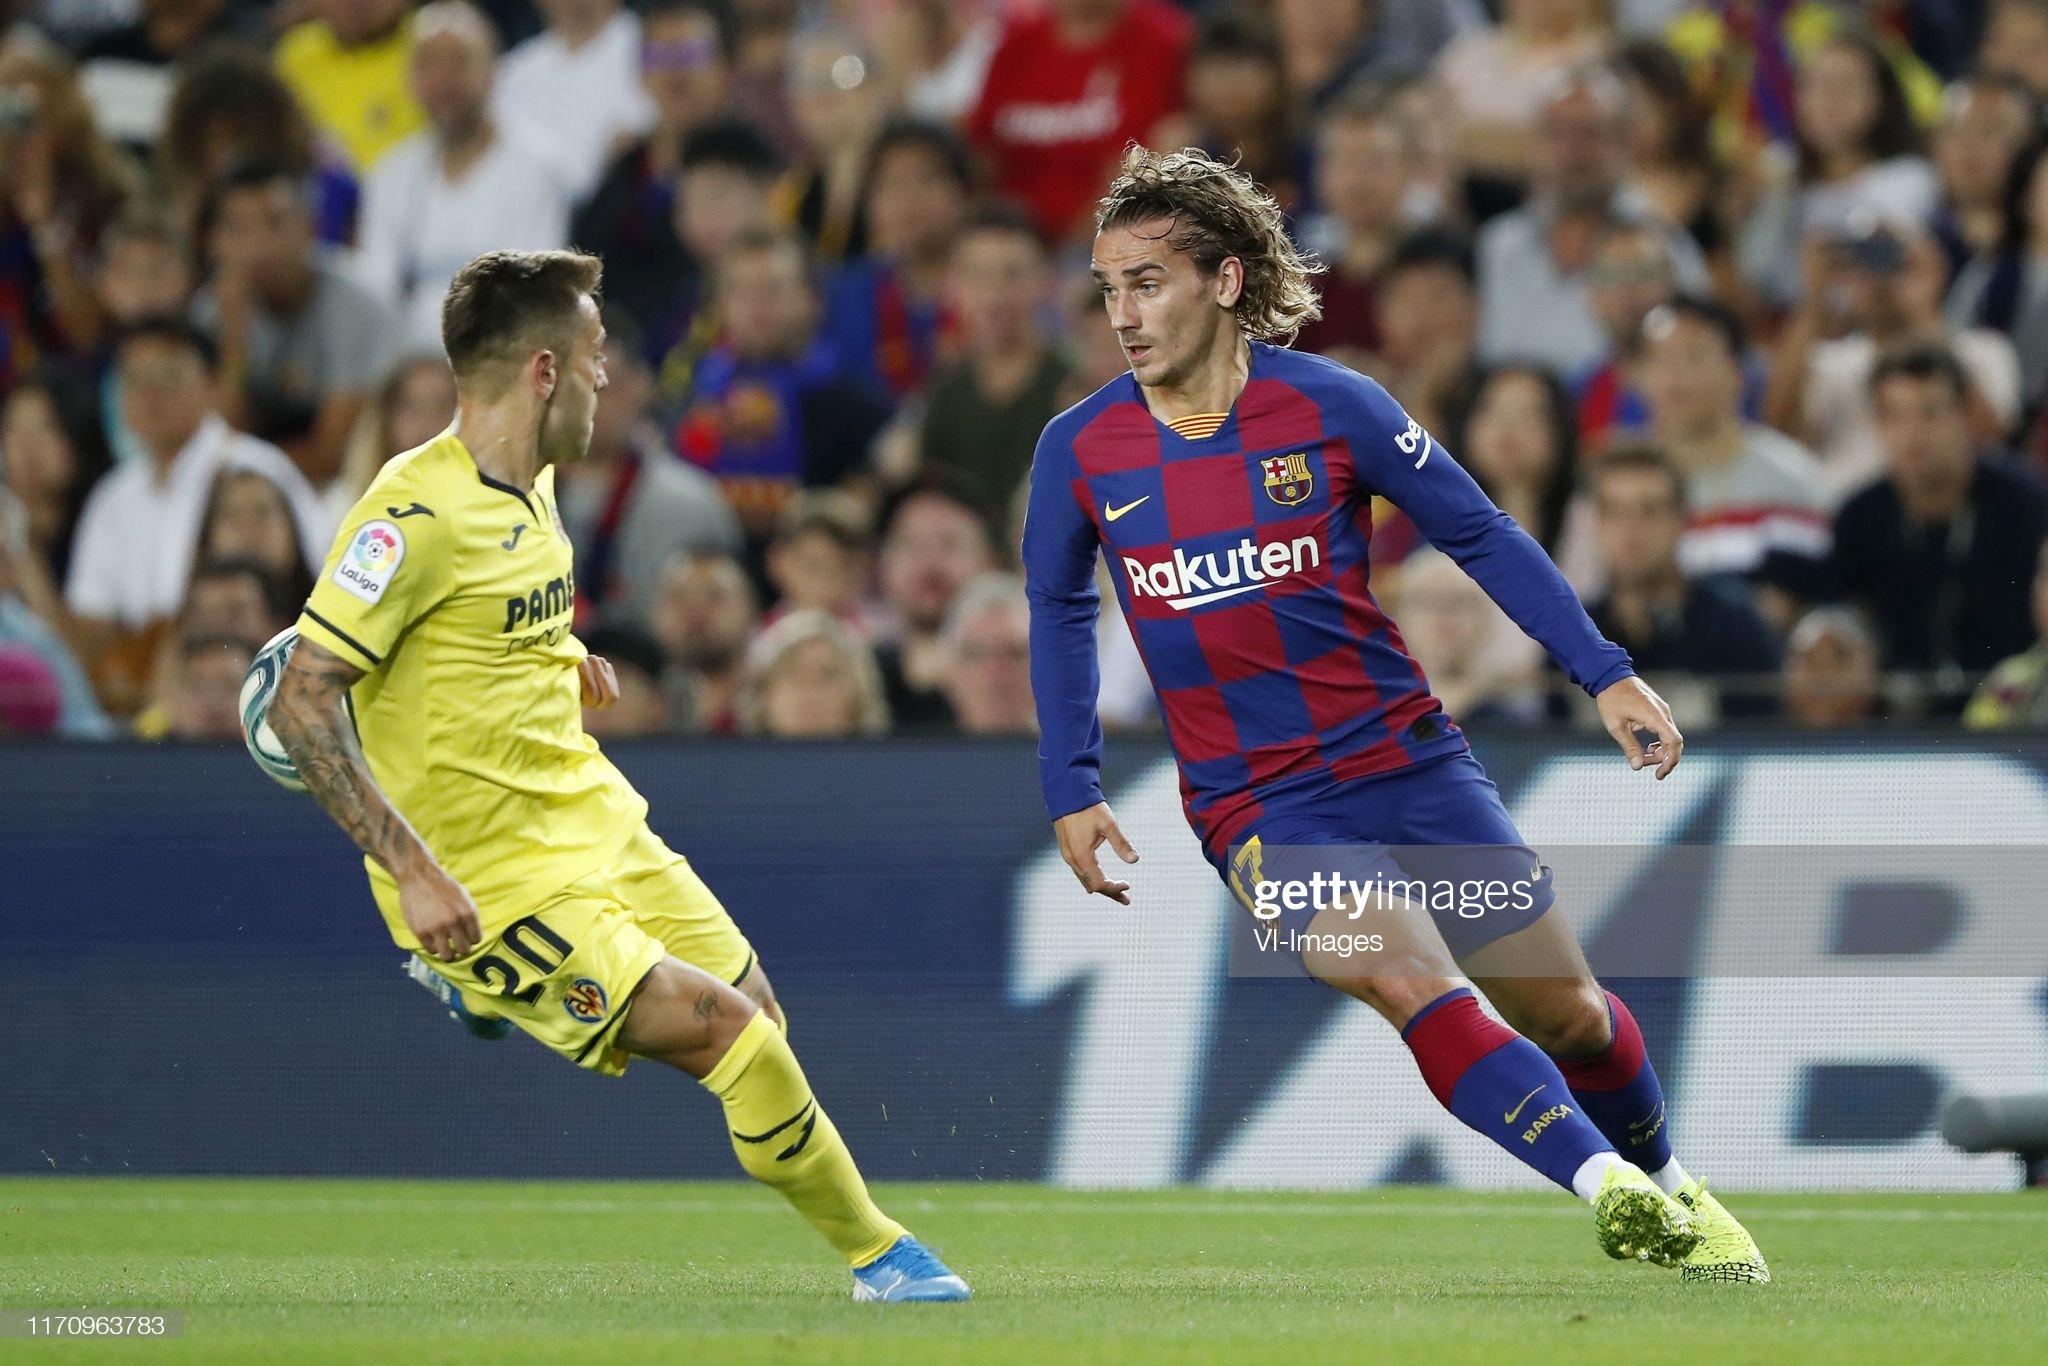 صور مباراة : برشلونة - فياريال 2-1 ( 24-09-2019 )  Ruben-pena-of-villarreal-cf-antoine-griezmann-of-fc-barcelona-during-picture-id1170963783?s=2048x2048